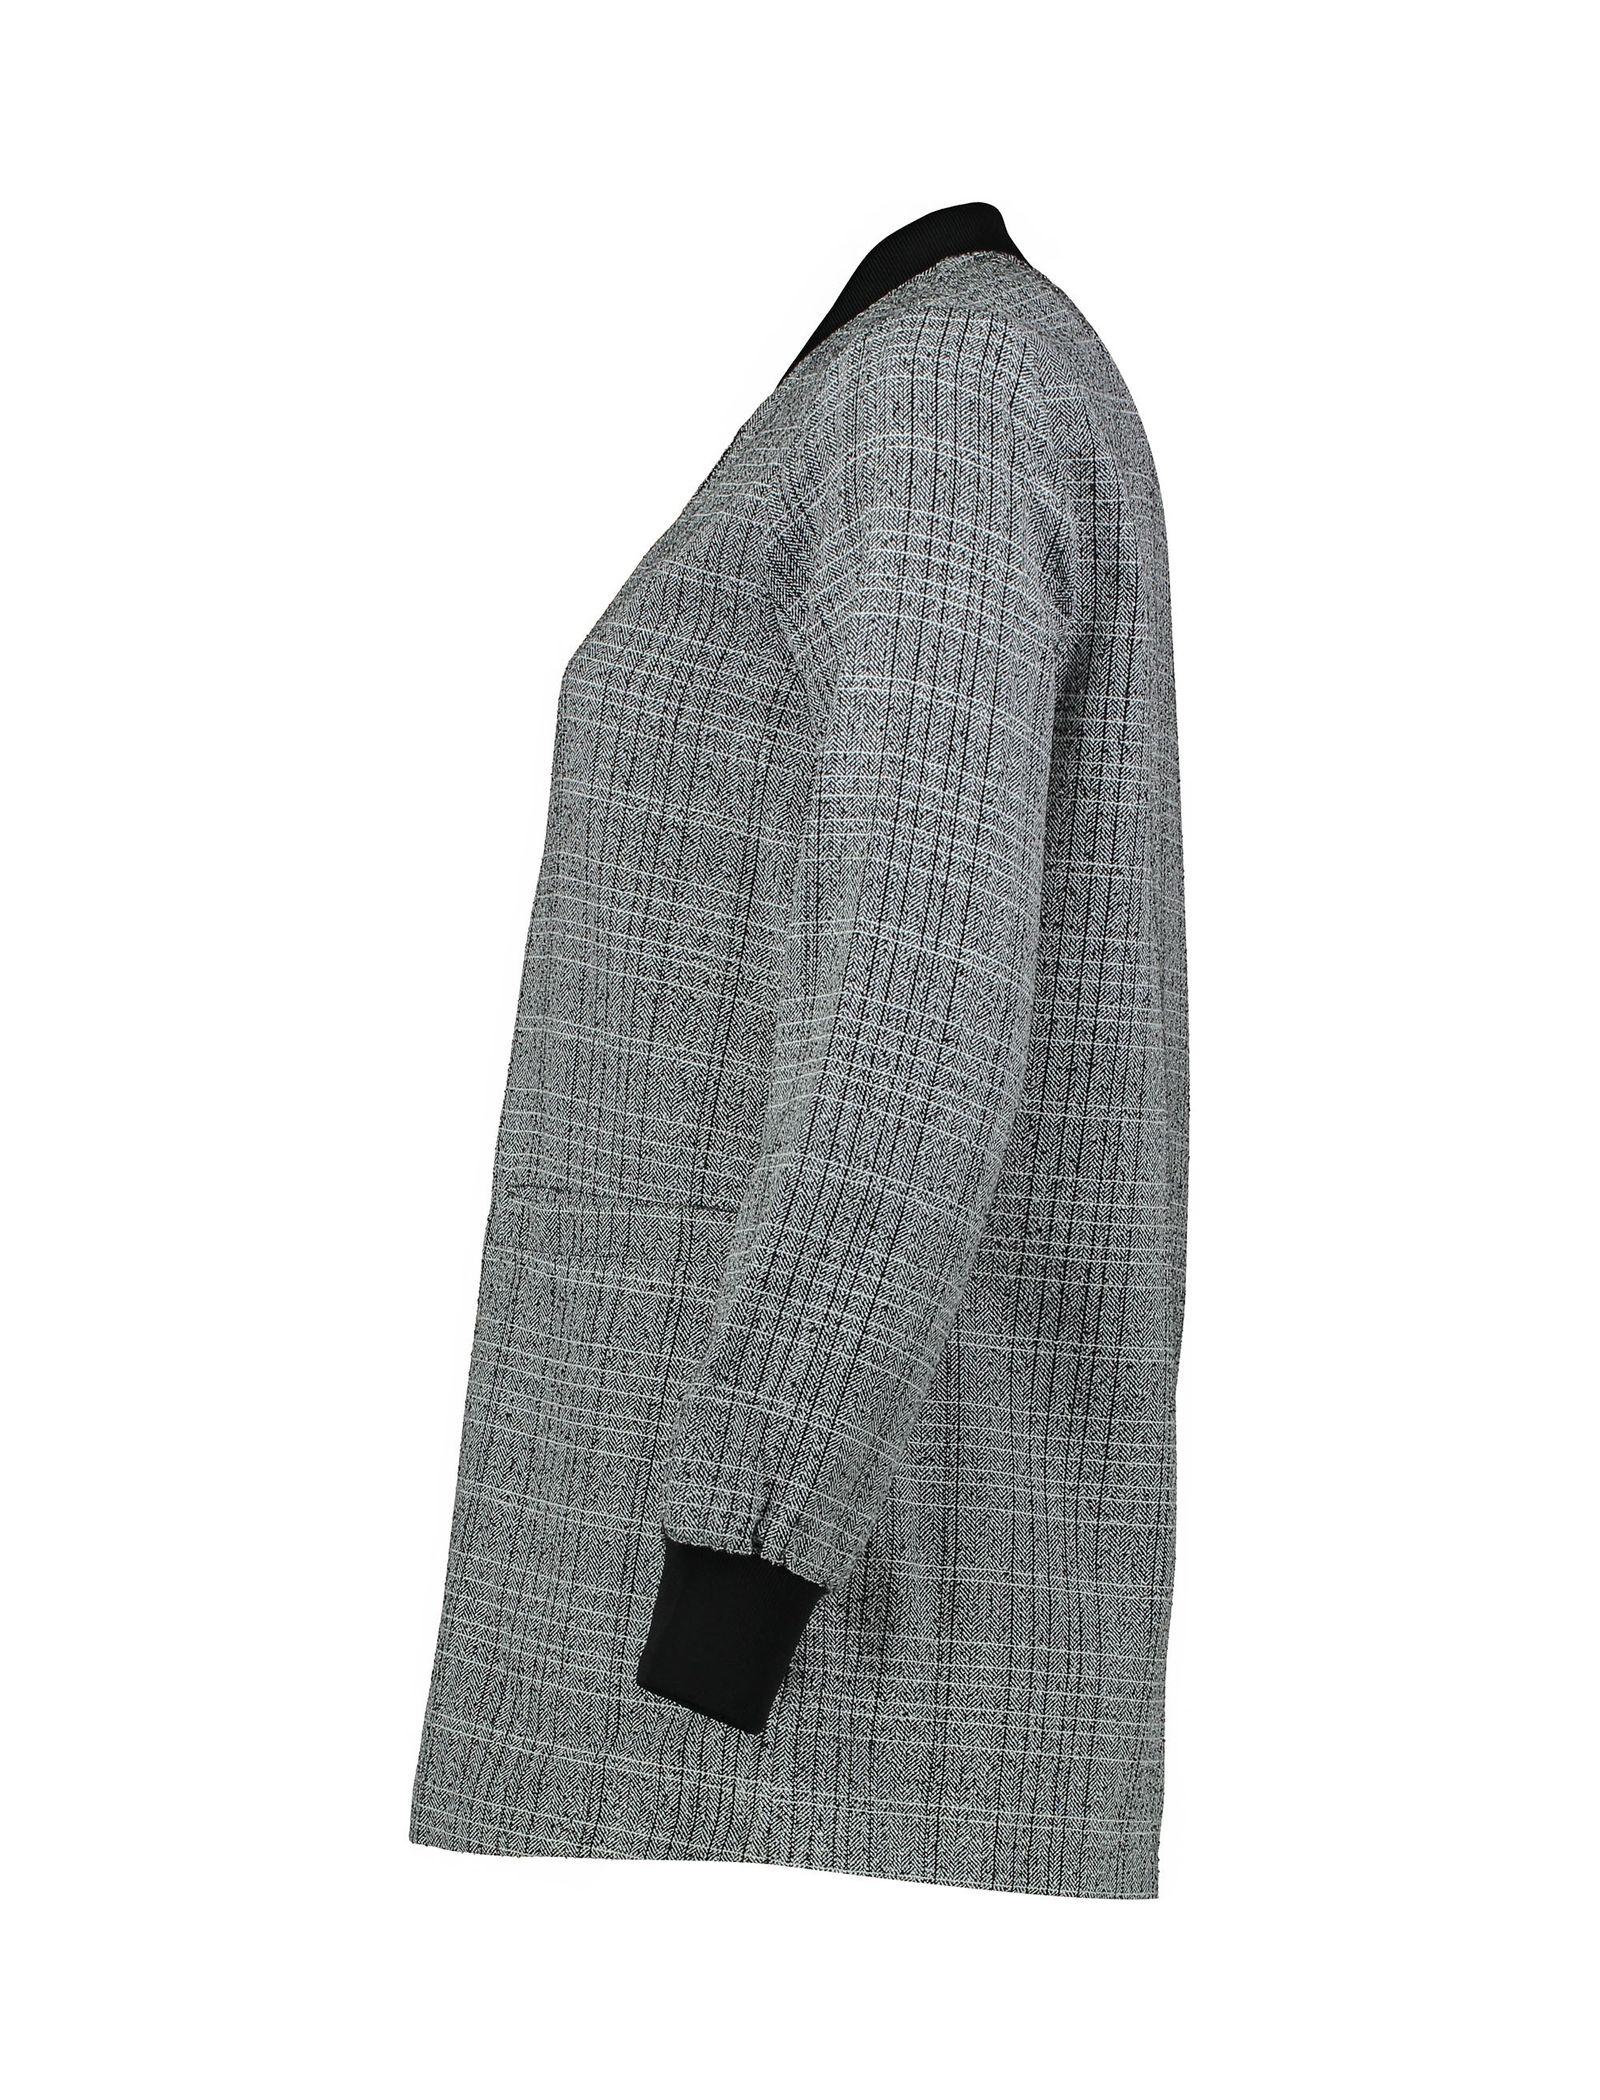 کت ویسکوز بلند زنانه - کوتون - طوسي - 3